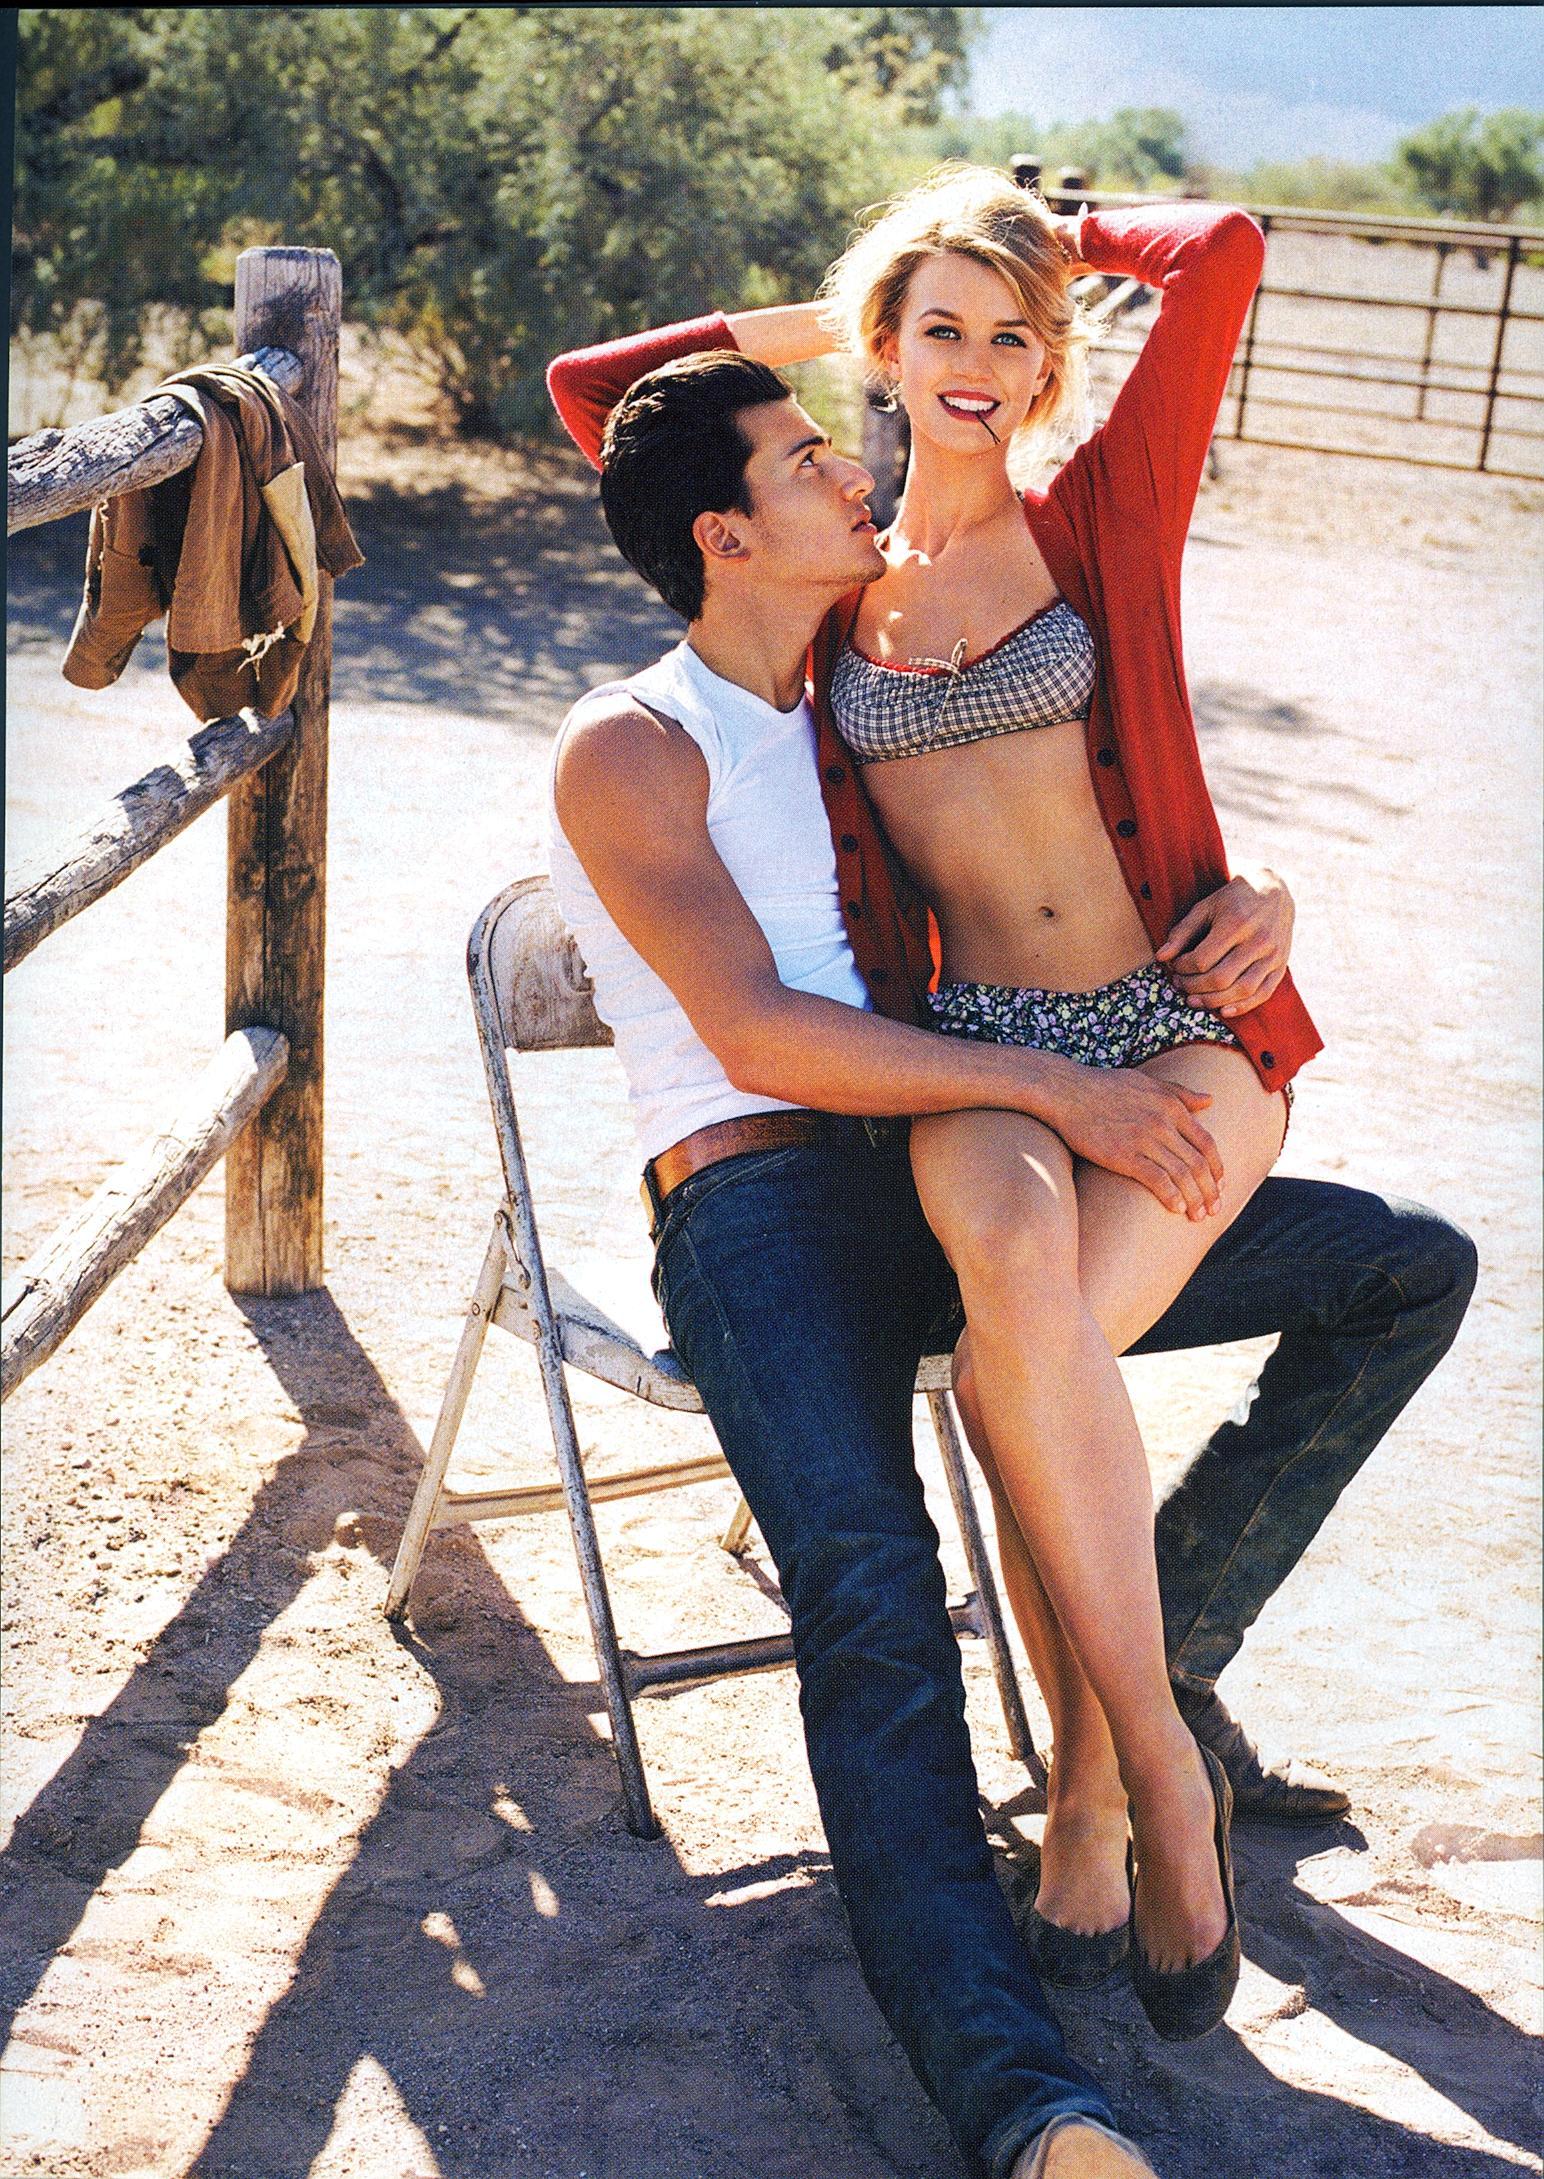 Pamela Hanson shoots Jayne moore for US Glamor Magazine Marilyn Monroe inspired fashion story the misfits marilyn monroe summer style summer love flirtation young love  cute lingerie shoot  with steve gold jayne moore